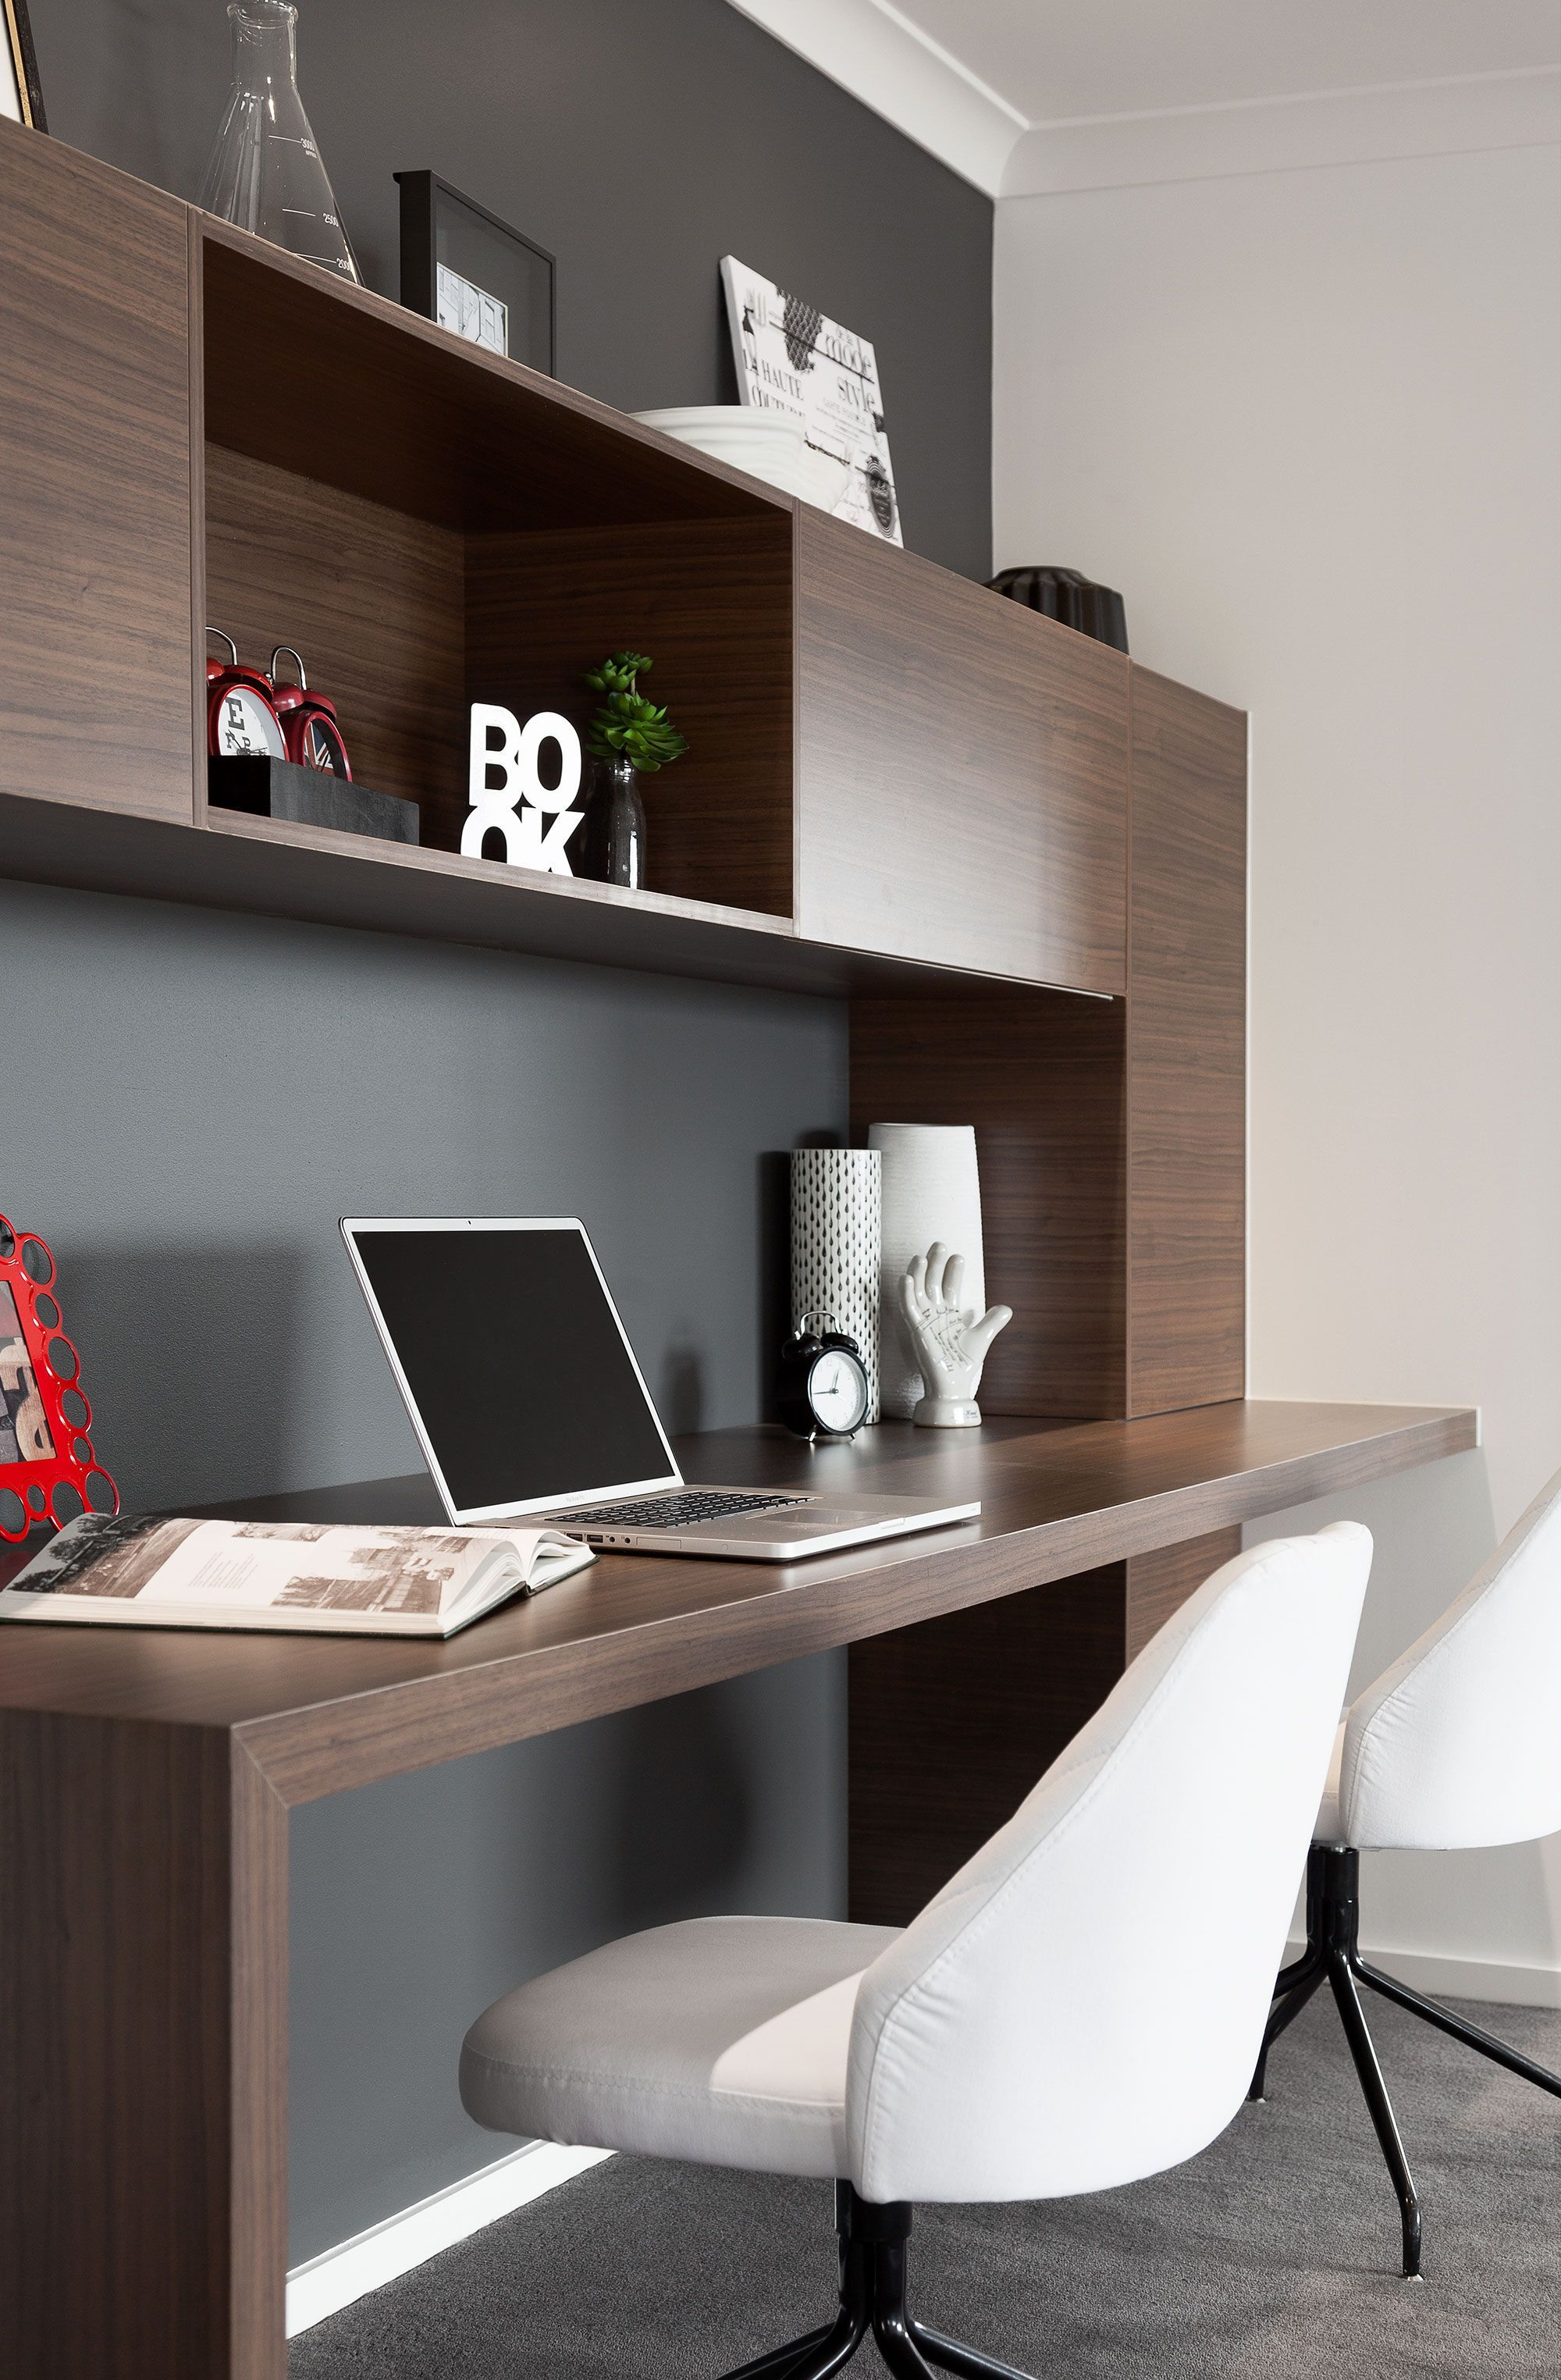 Top 10 Stunning Home Office Design Meuble Salon Design Bureaux A Domicile Contemporains Interieur De Bureau